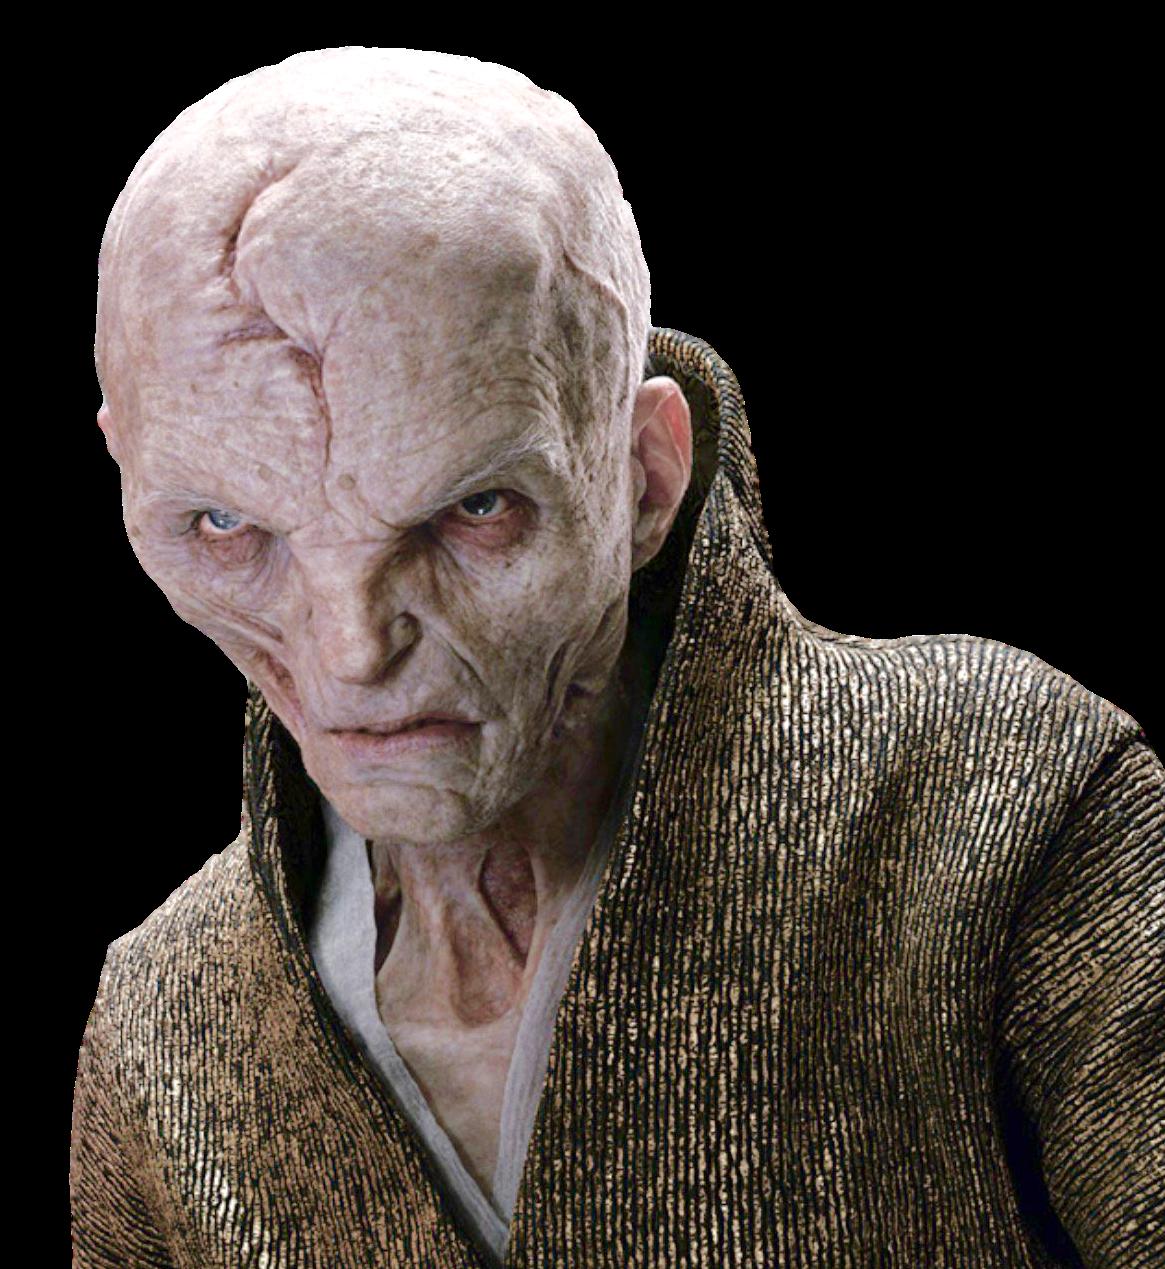 Oberster Anführer Snoke